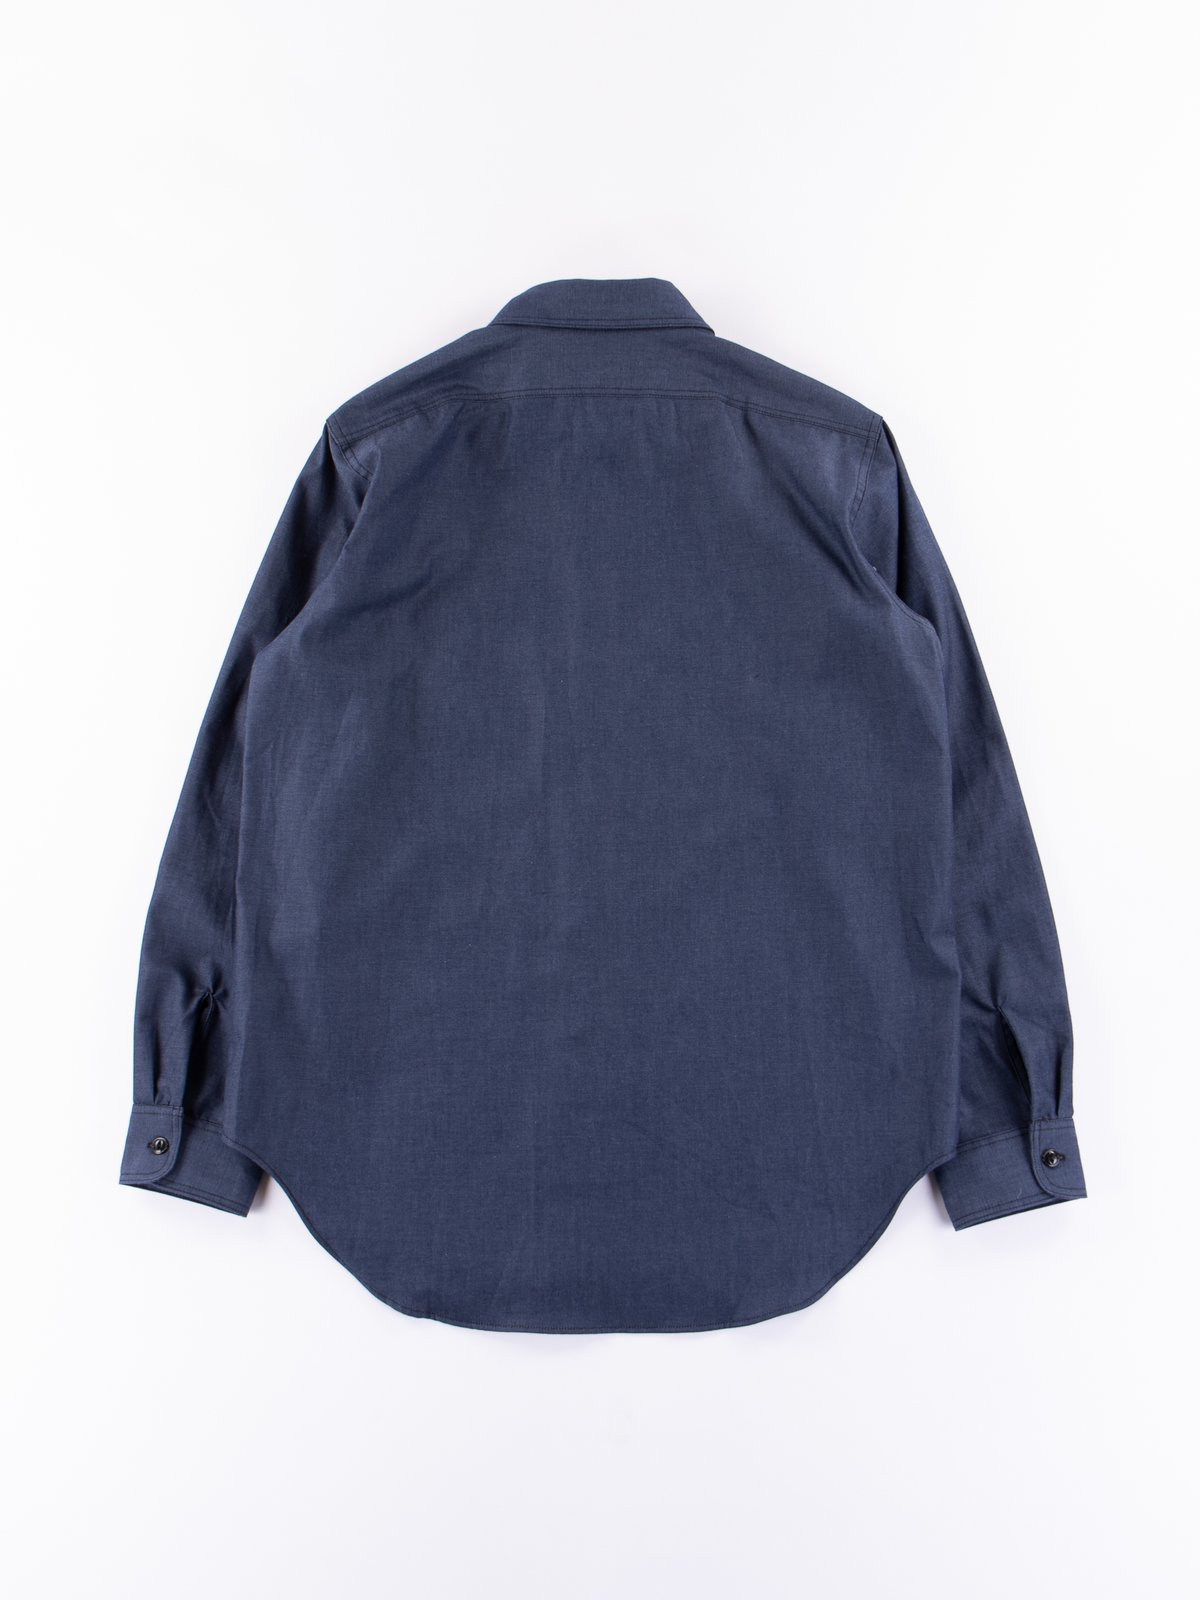 Indigo Cotton Denim Utility Shirt - Image 4